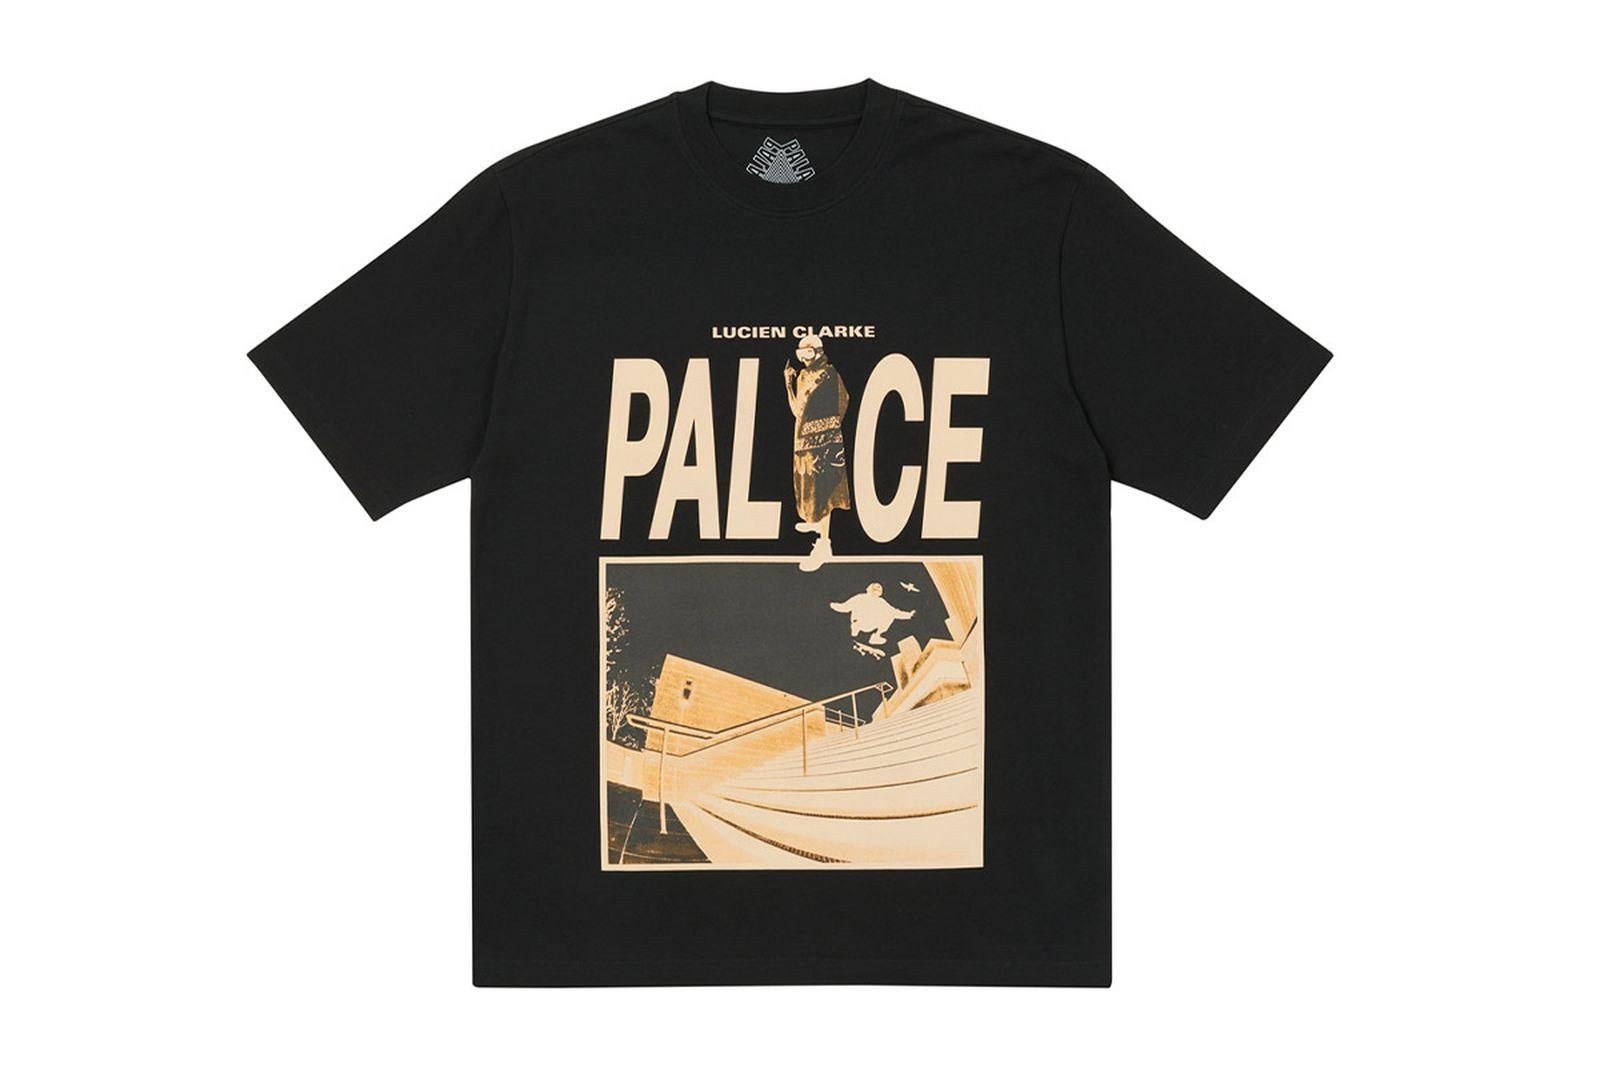 palace-crocs-classic-clog-release-date-price-08